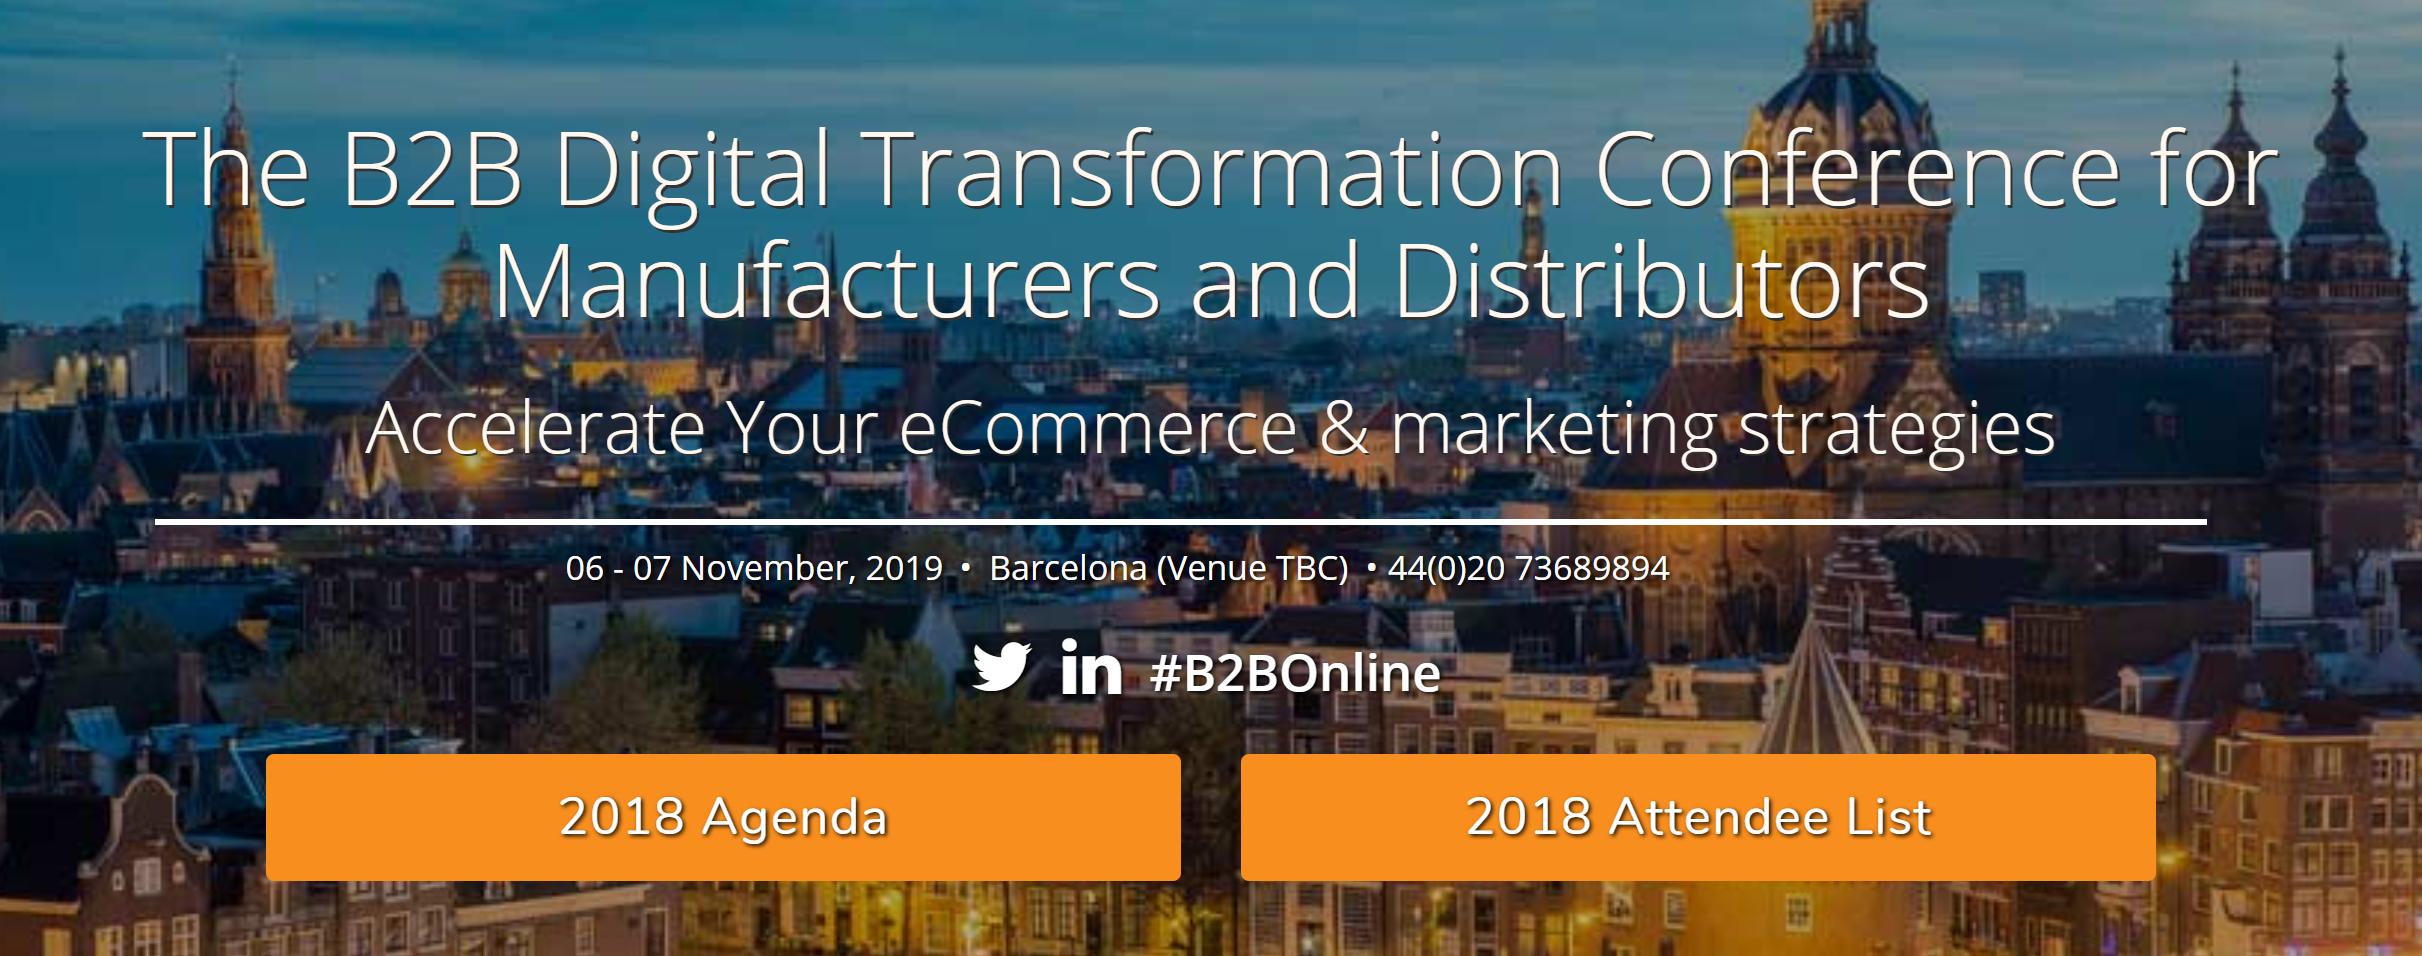 B2B Digital Transformation Conference